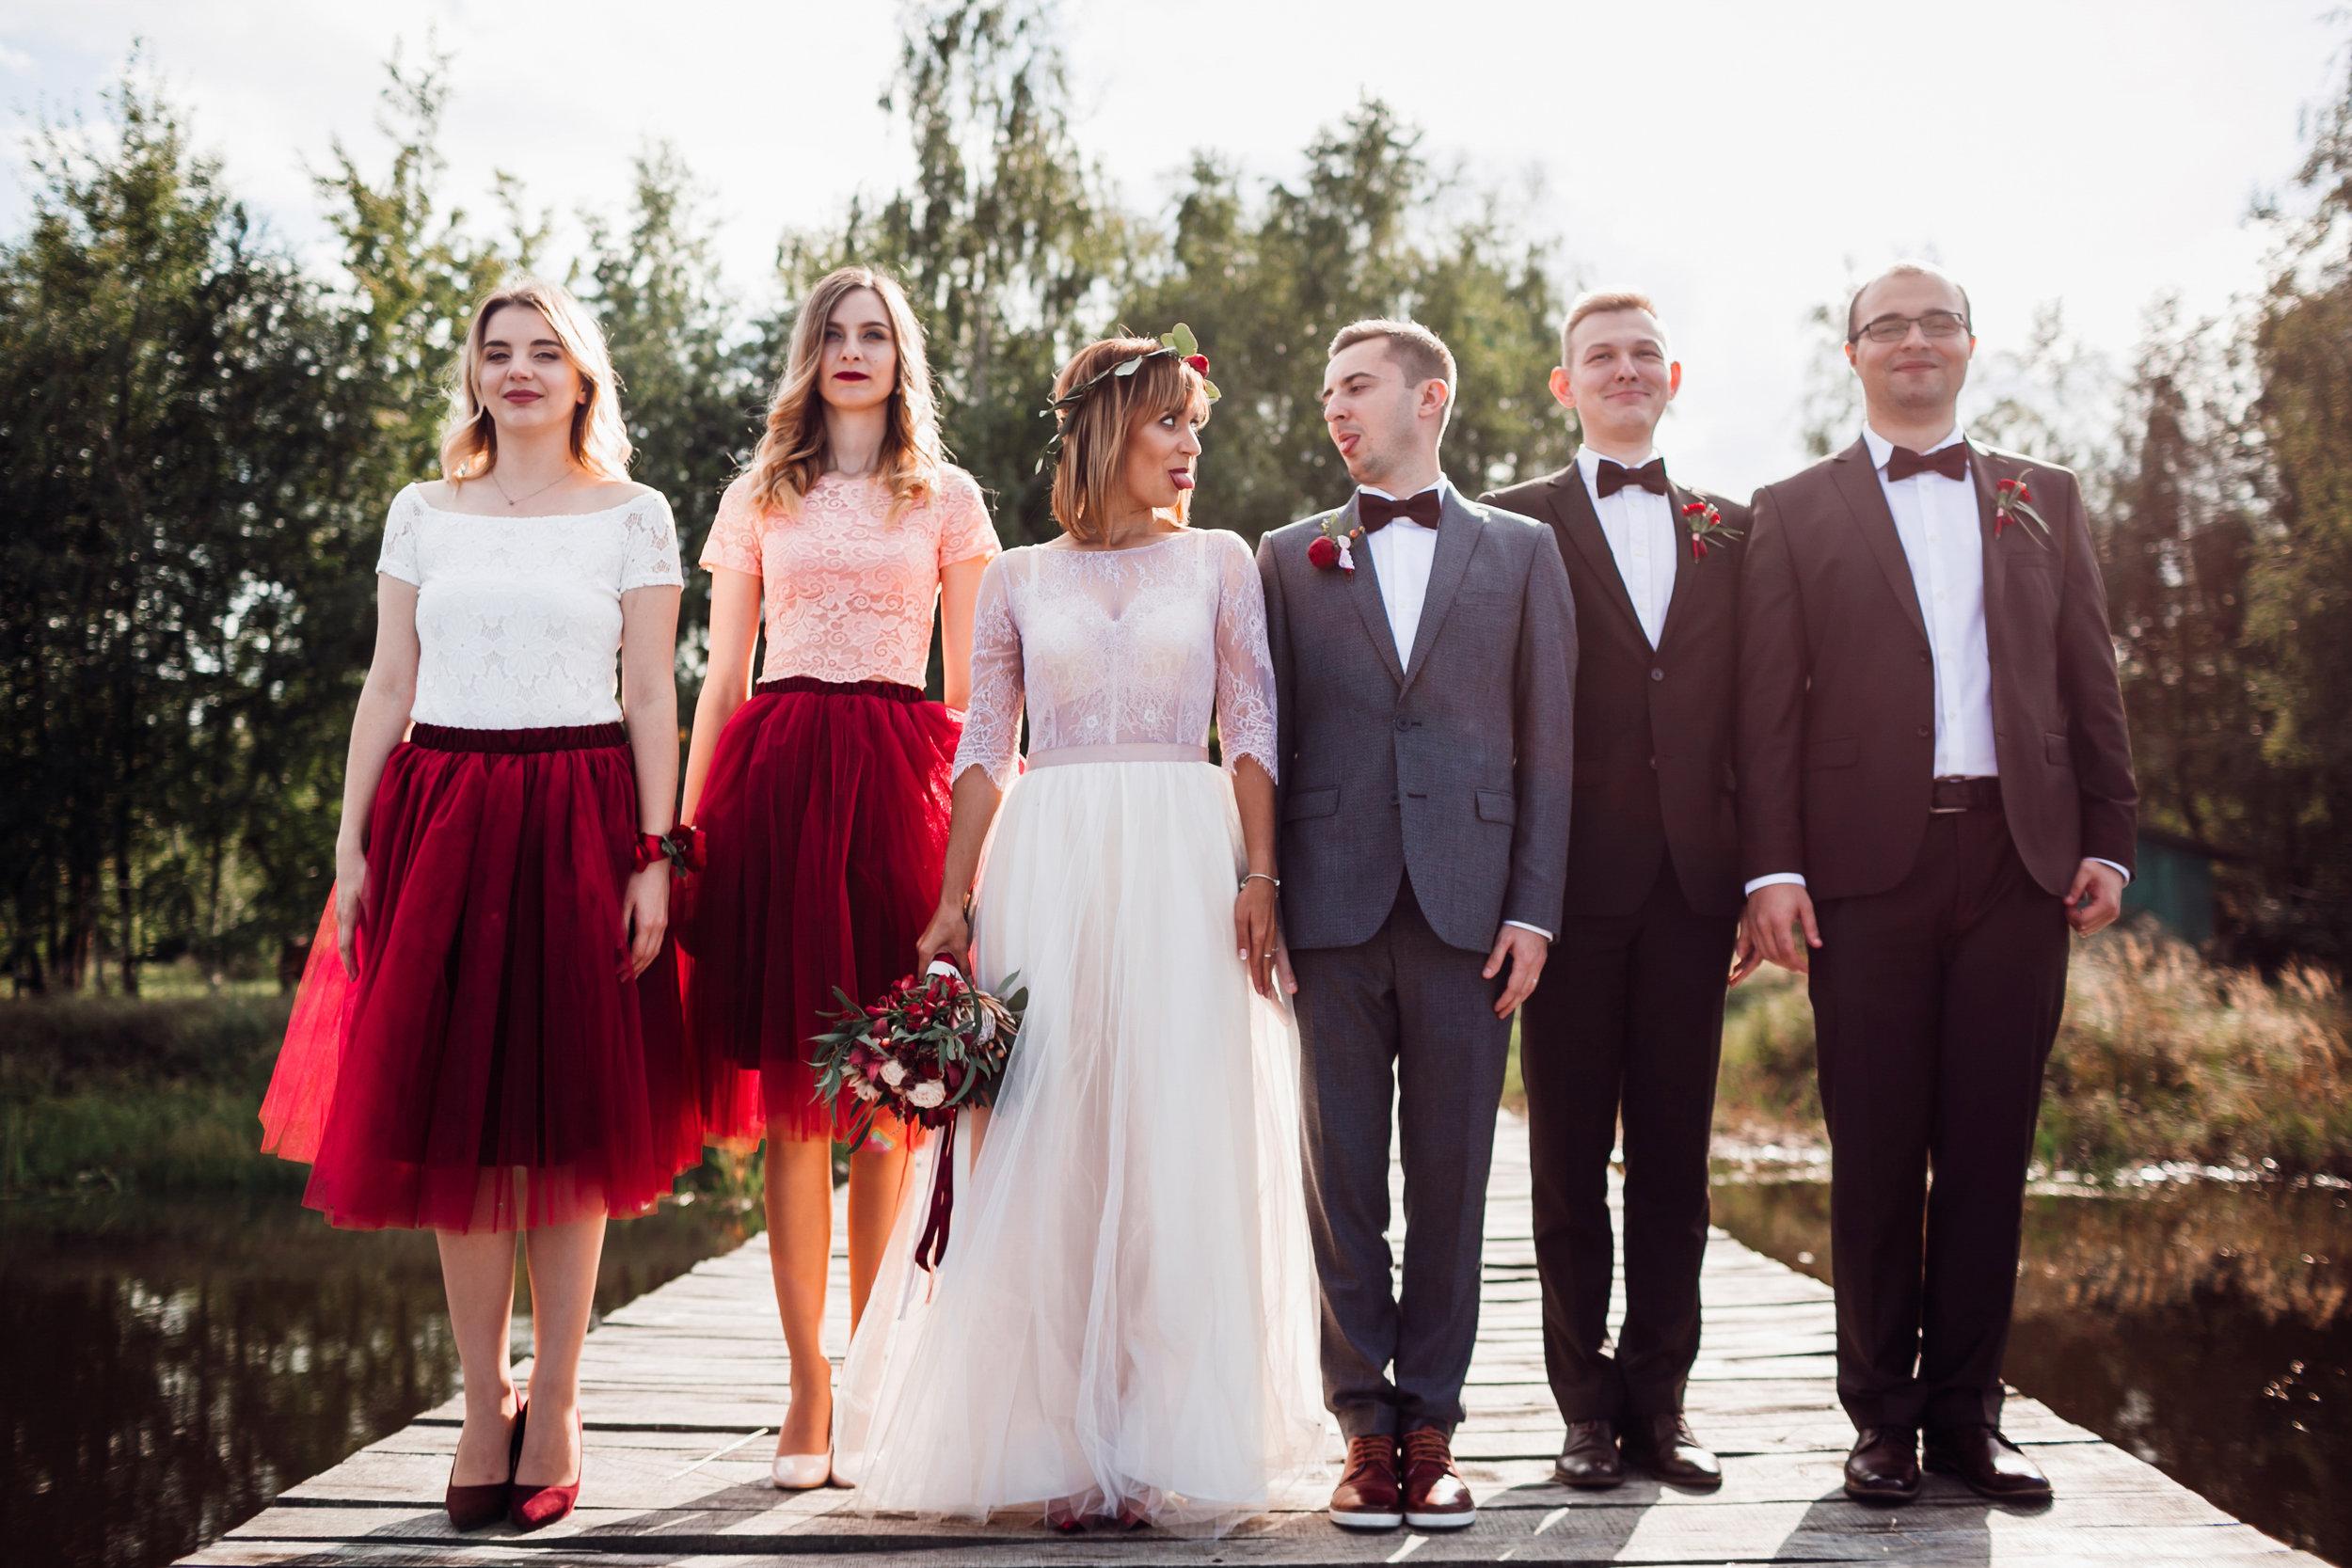 Outdoor wedding friends group photo